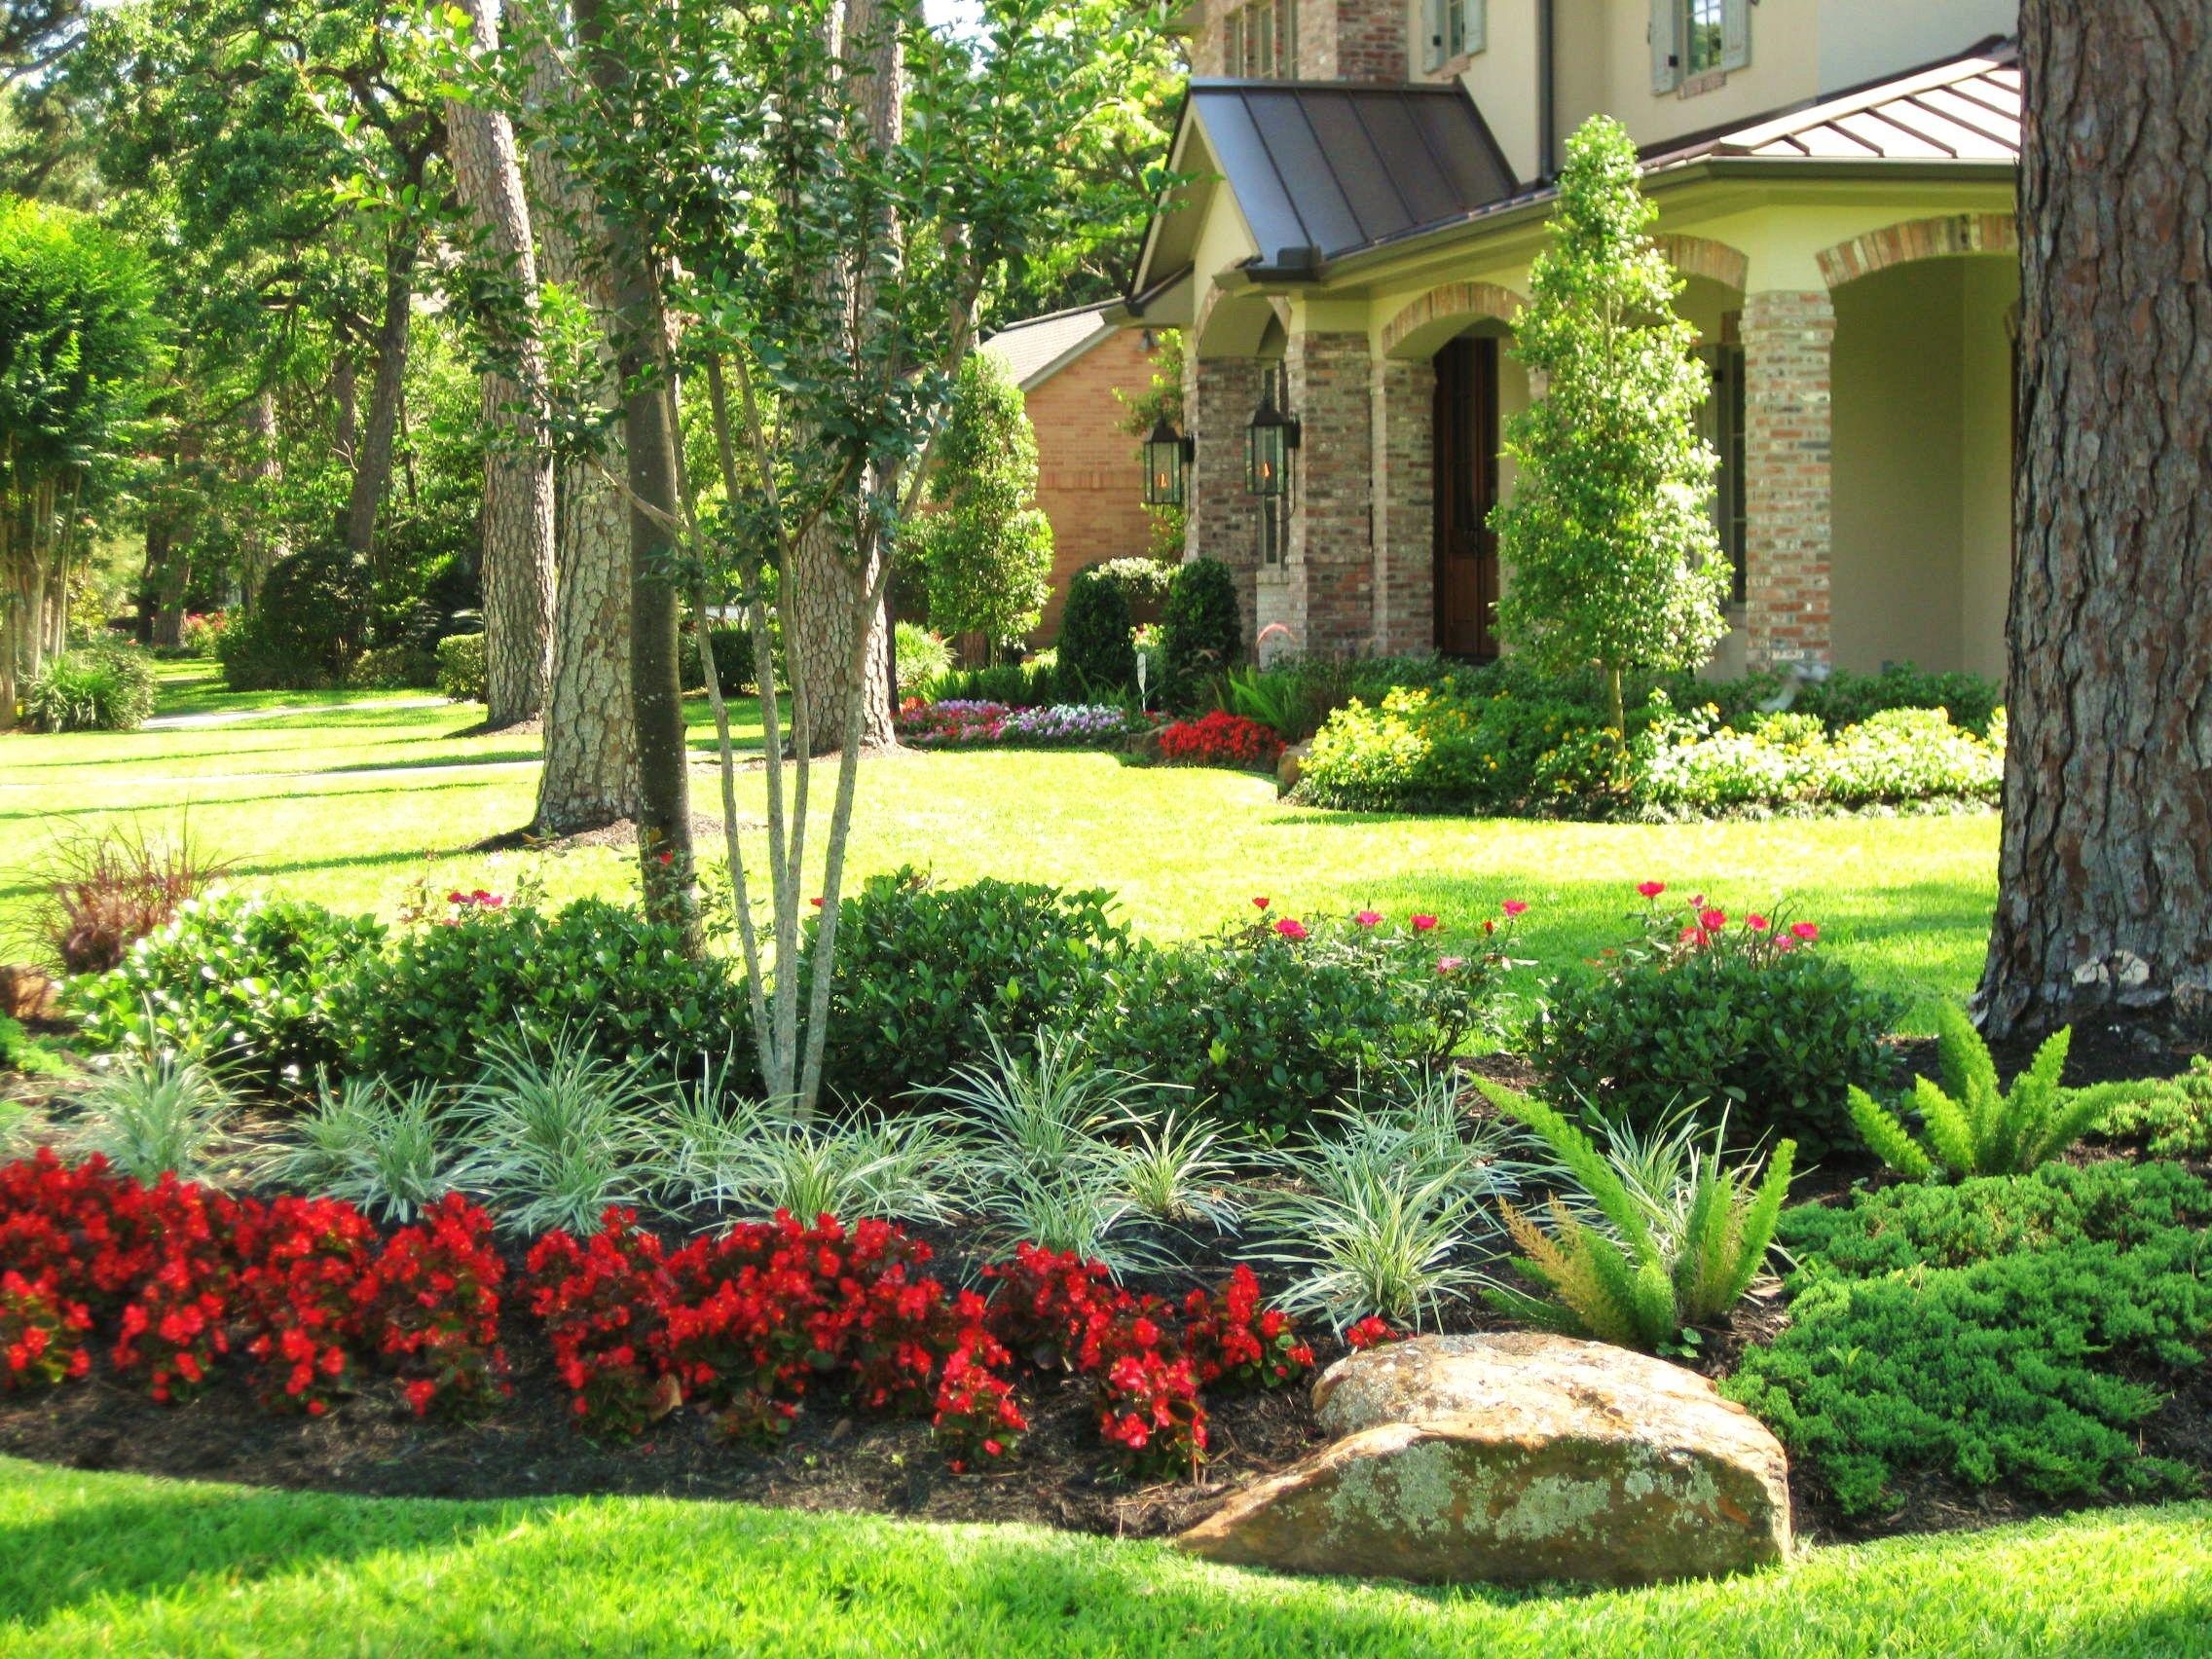 Mls Landscape Restoration Houston Tx Outdoor Living